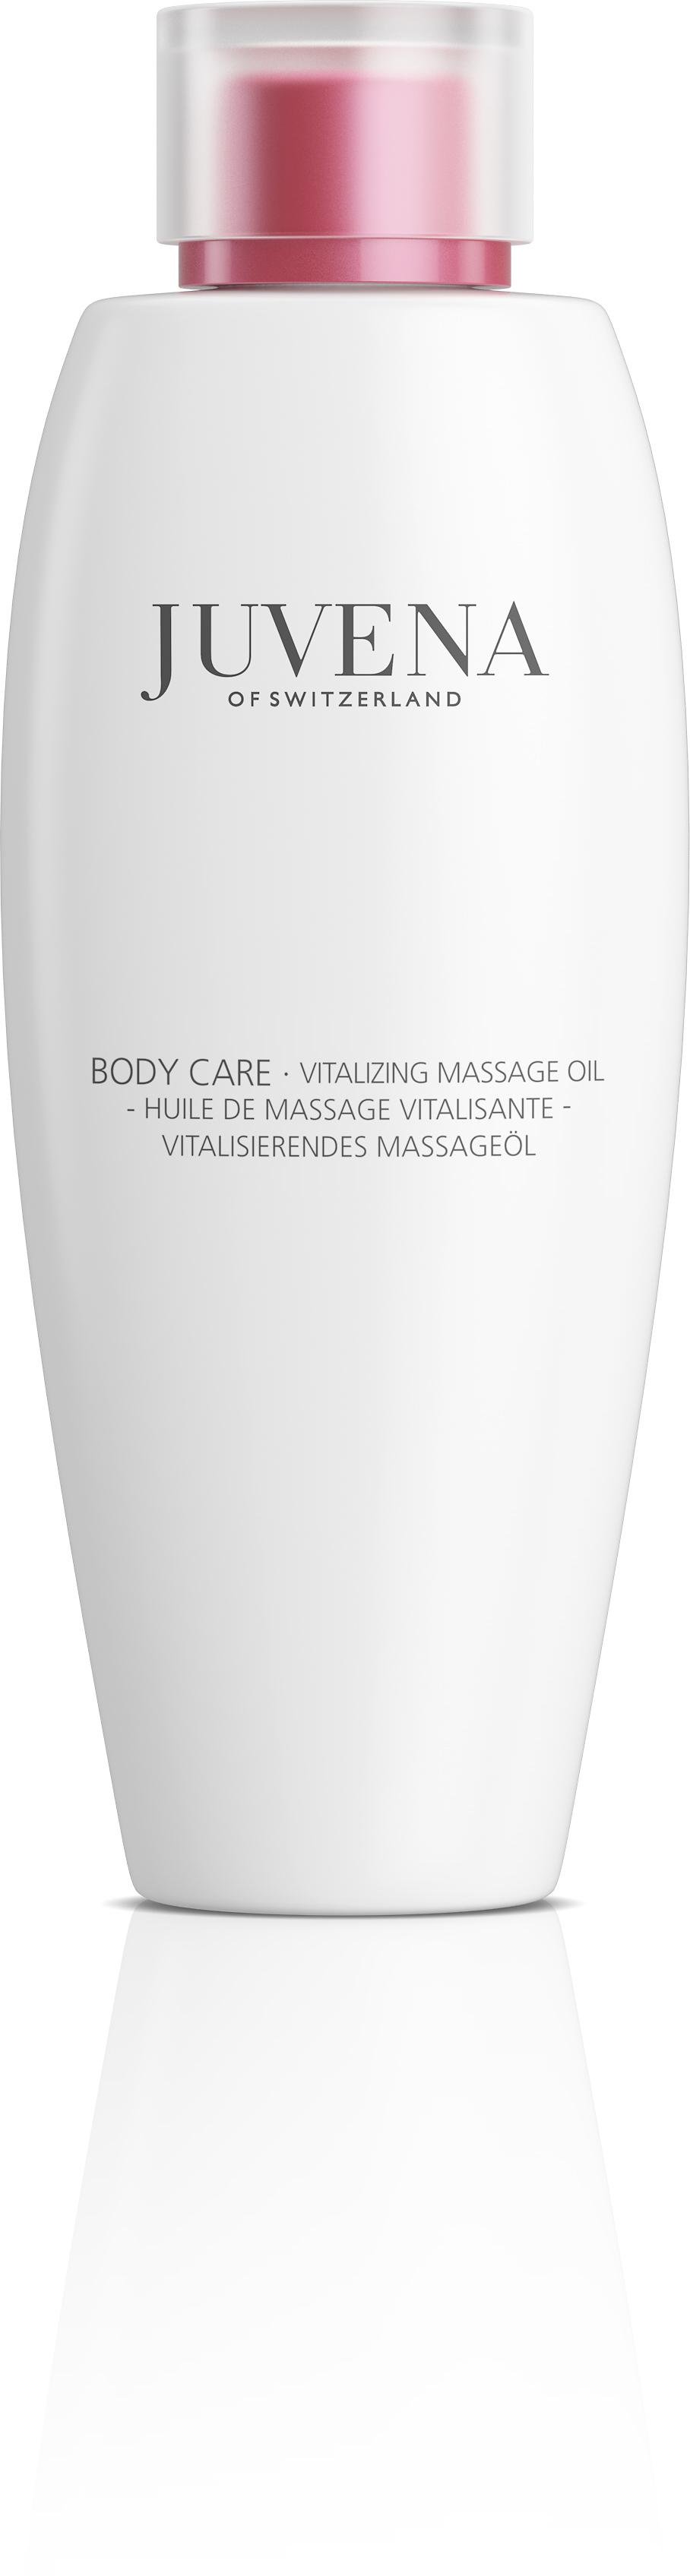 Juvena Body Luxury Performance Massage Oil 200 ml